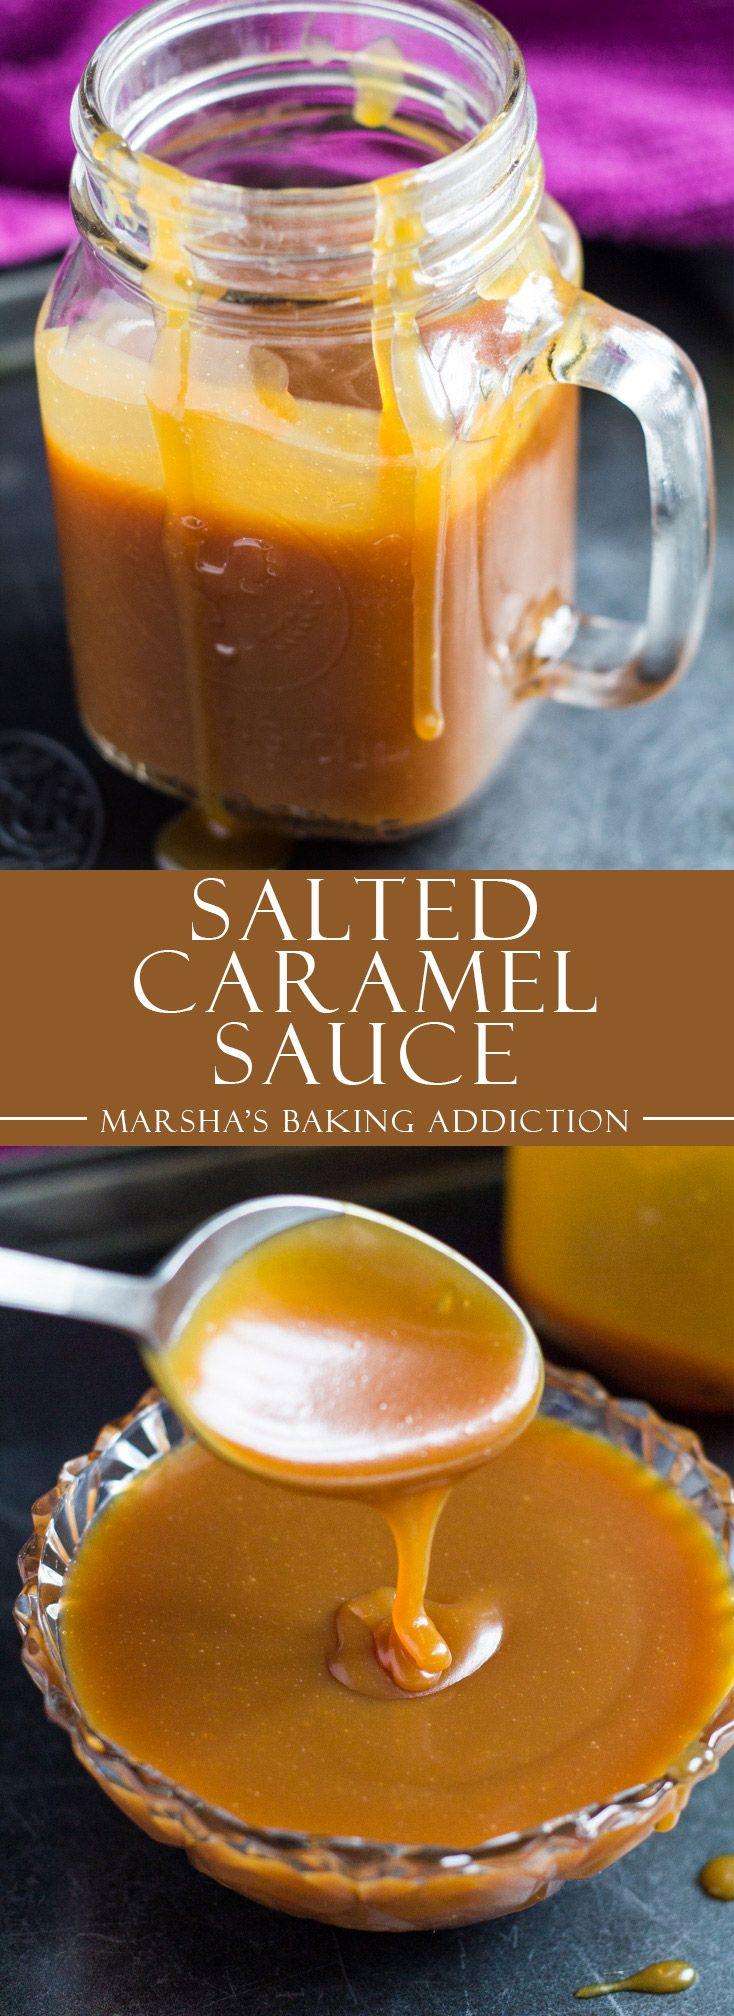 Homemade Salted Caramel Sauce | marshasbakingaddiction.com @marshasbakeblog